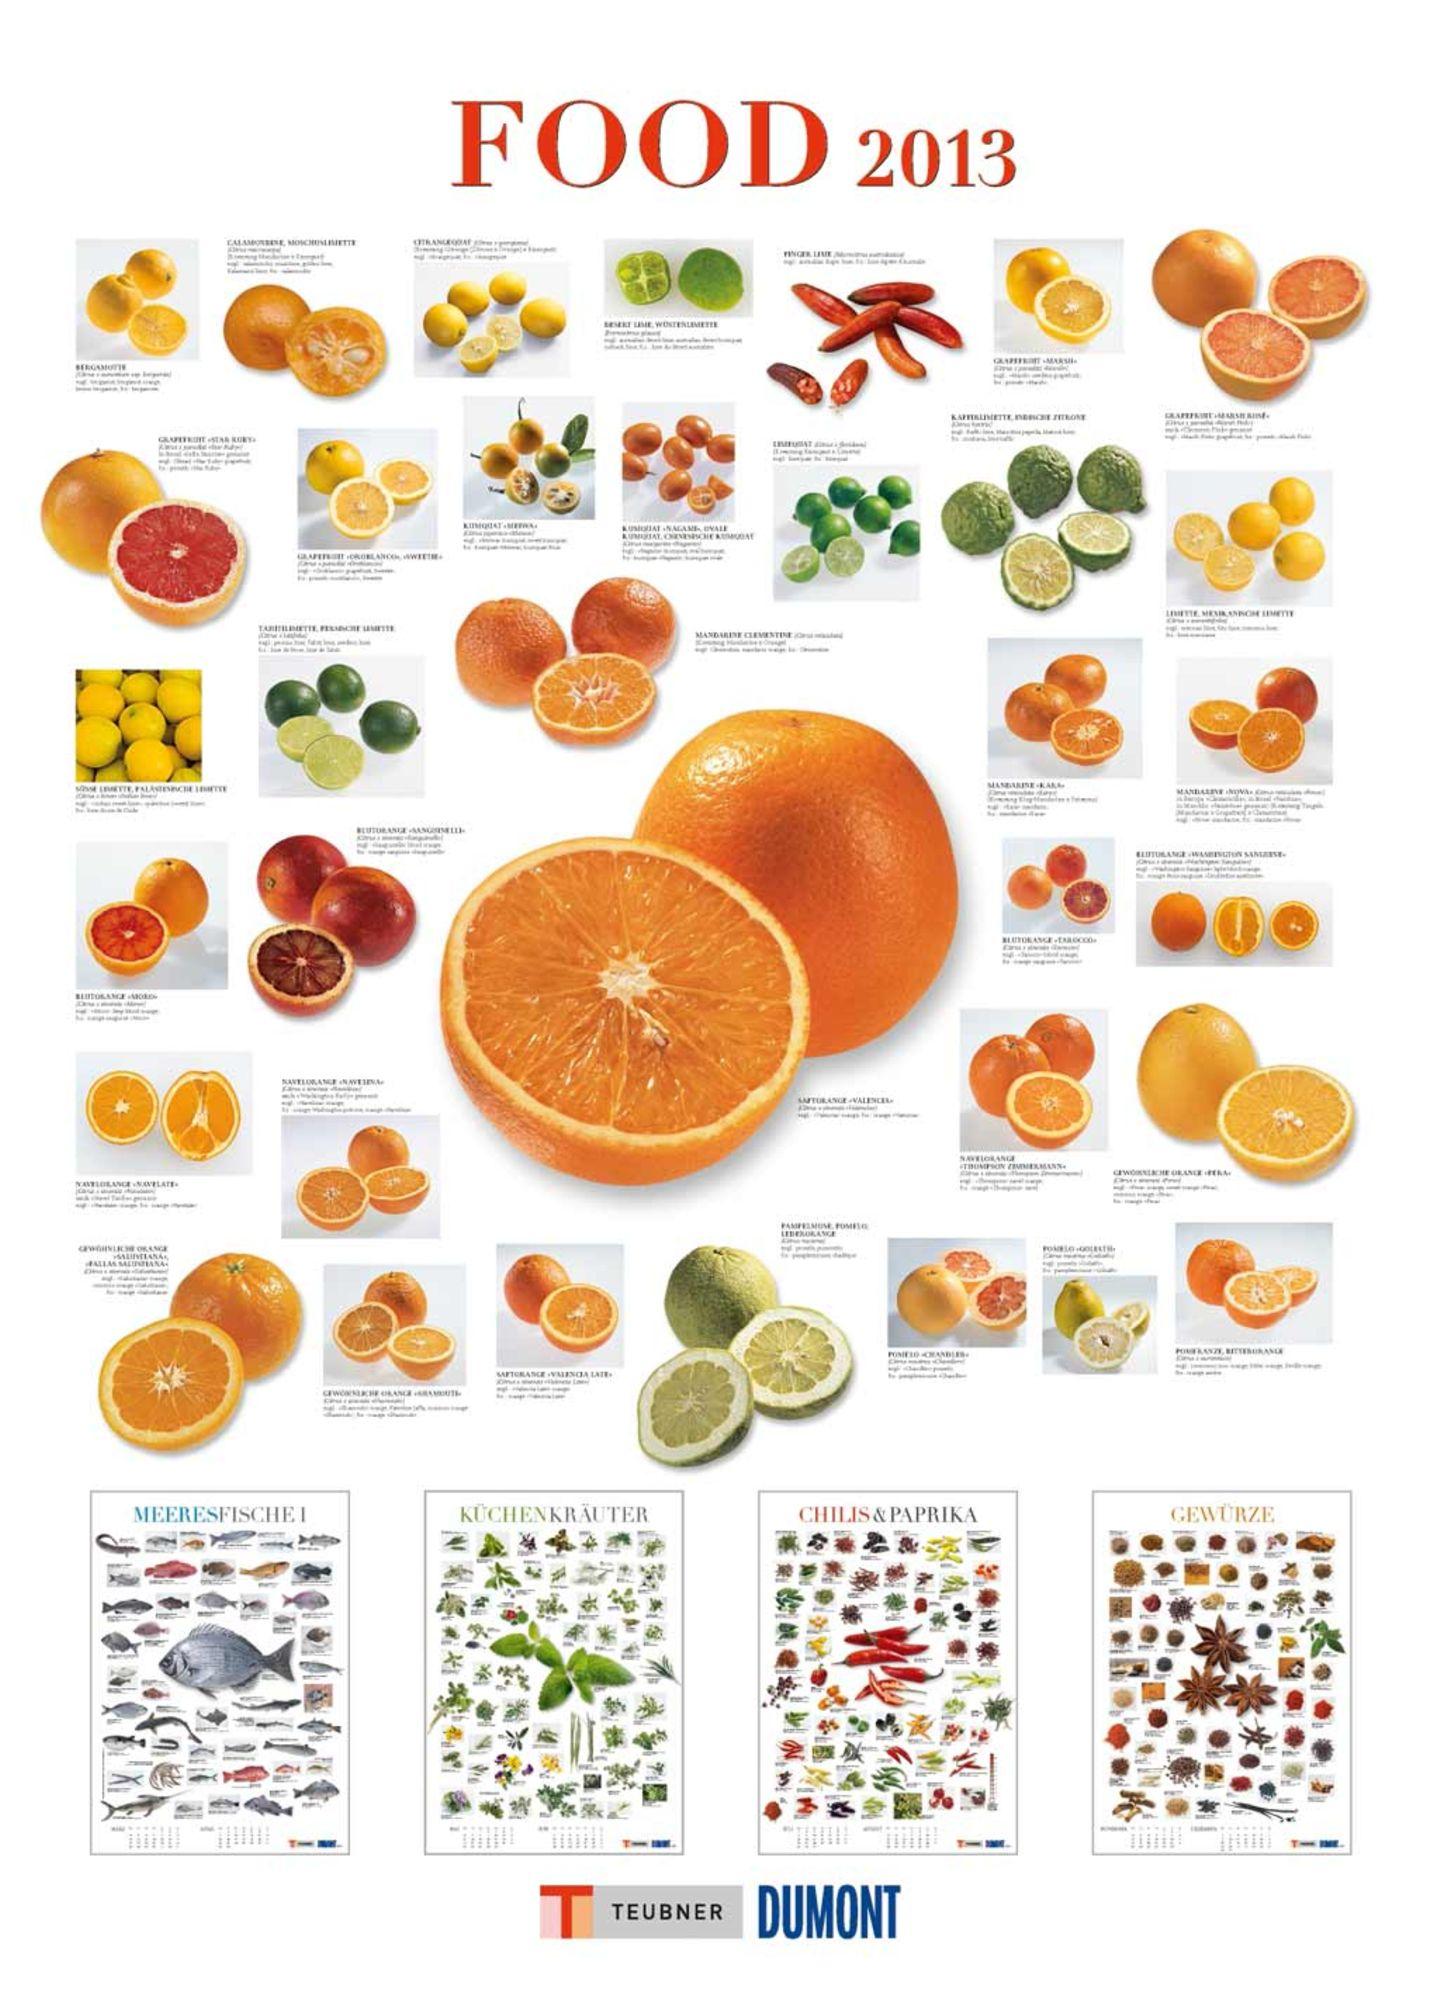 Food-Kalender in Posterformat